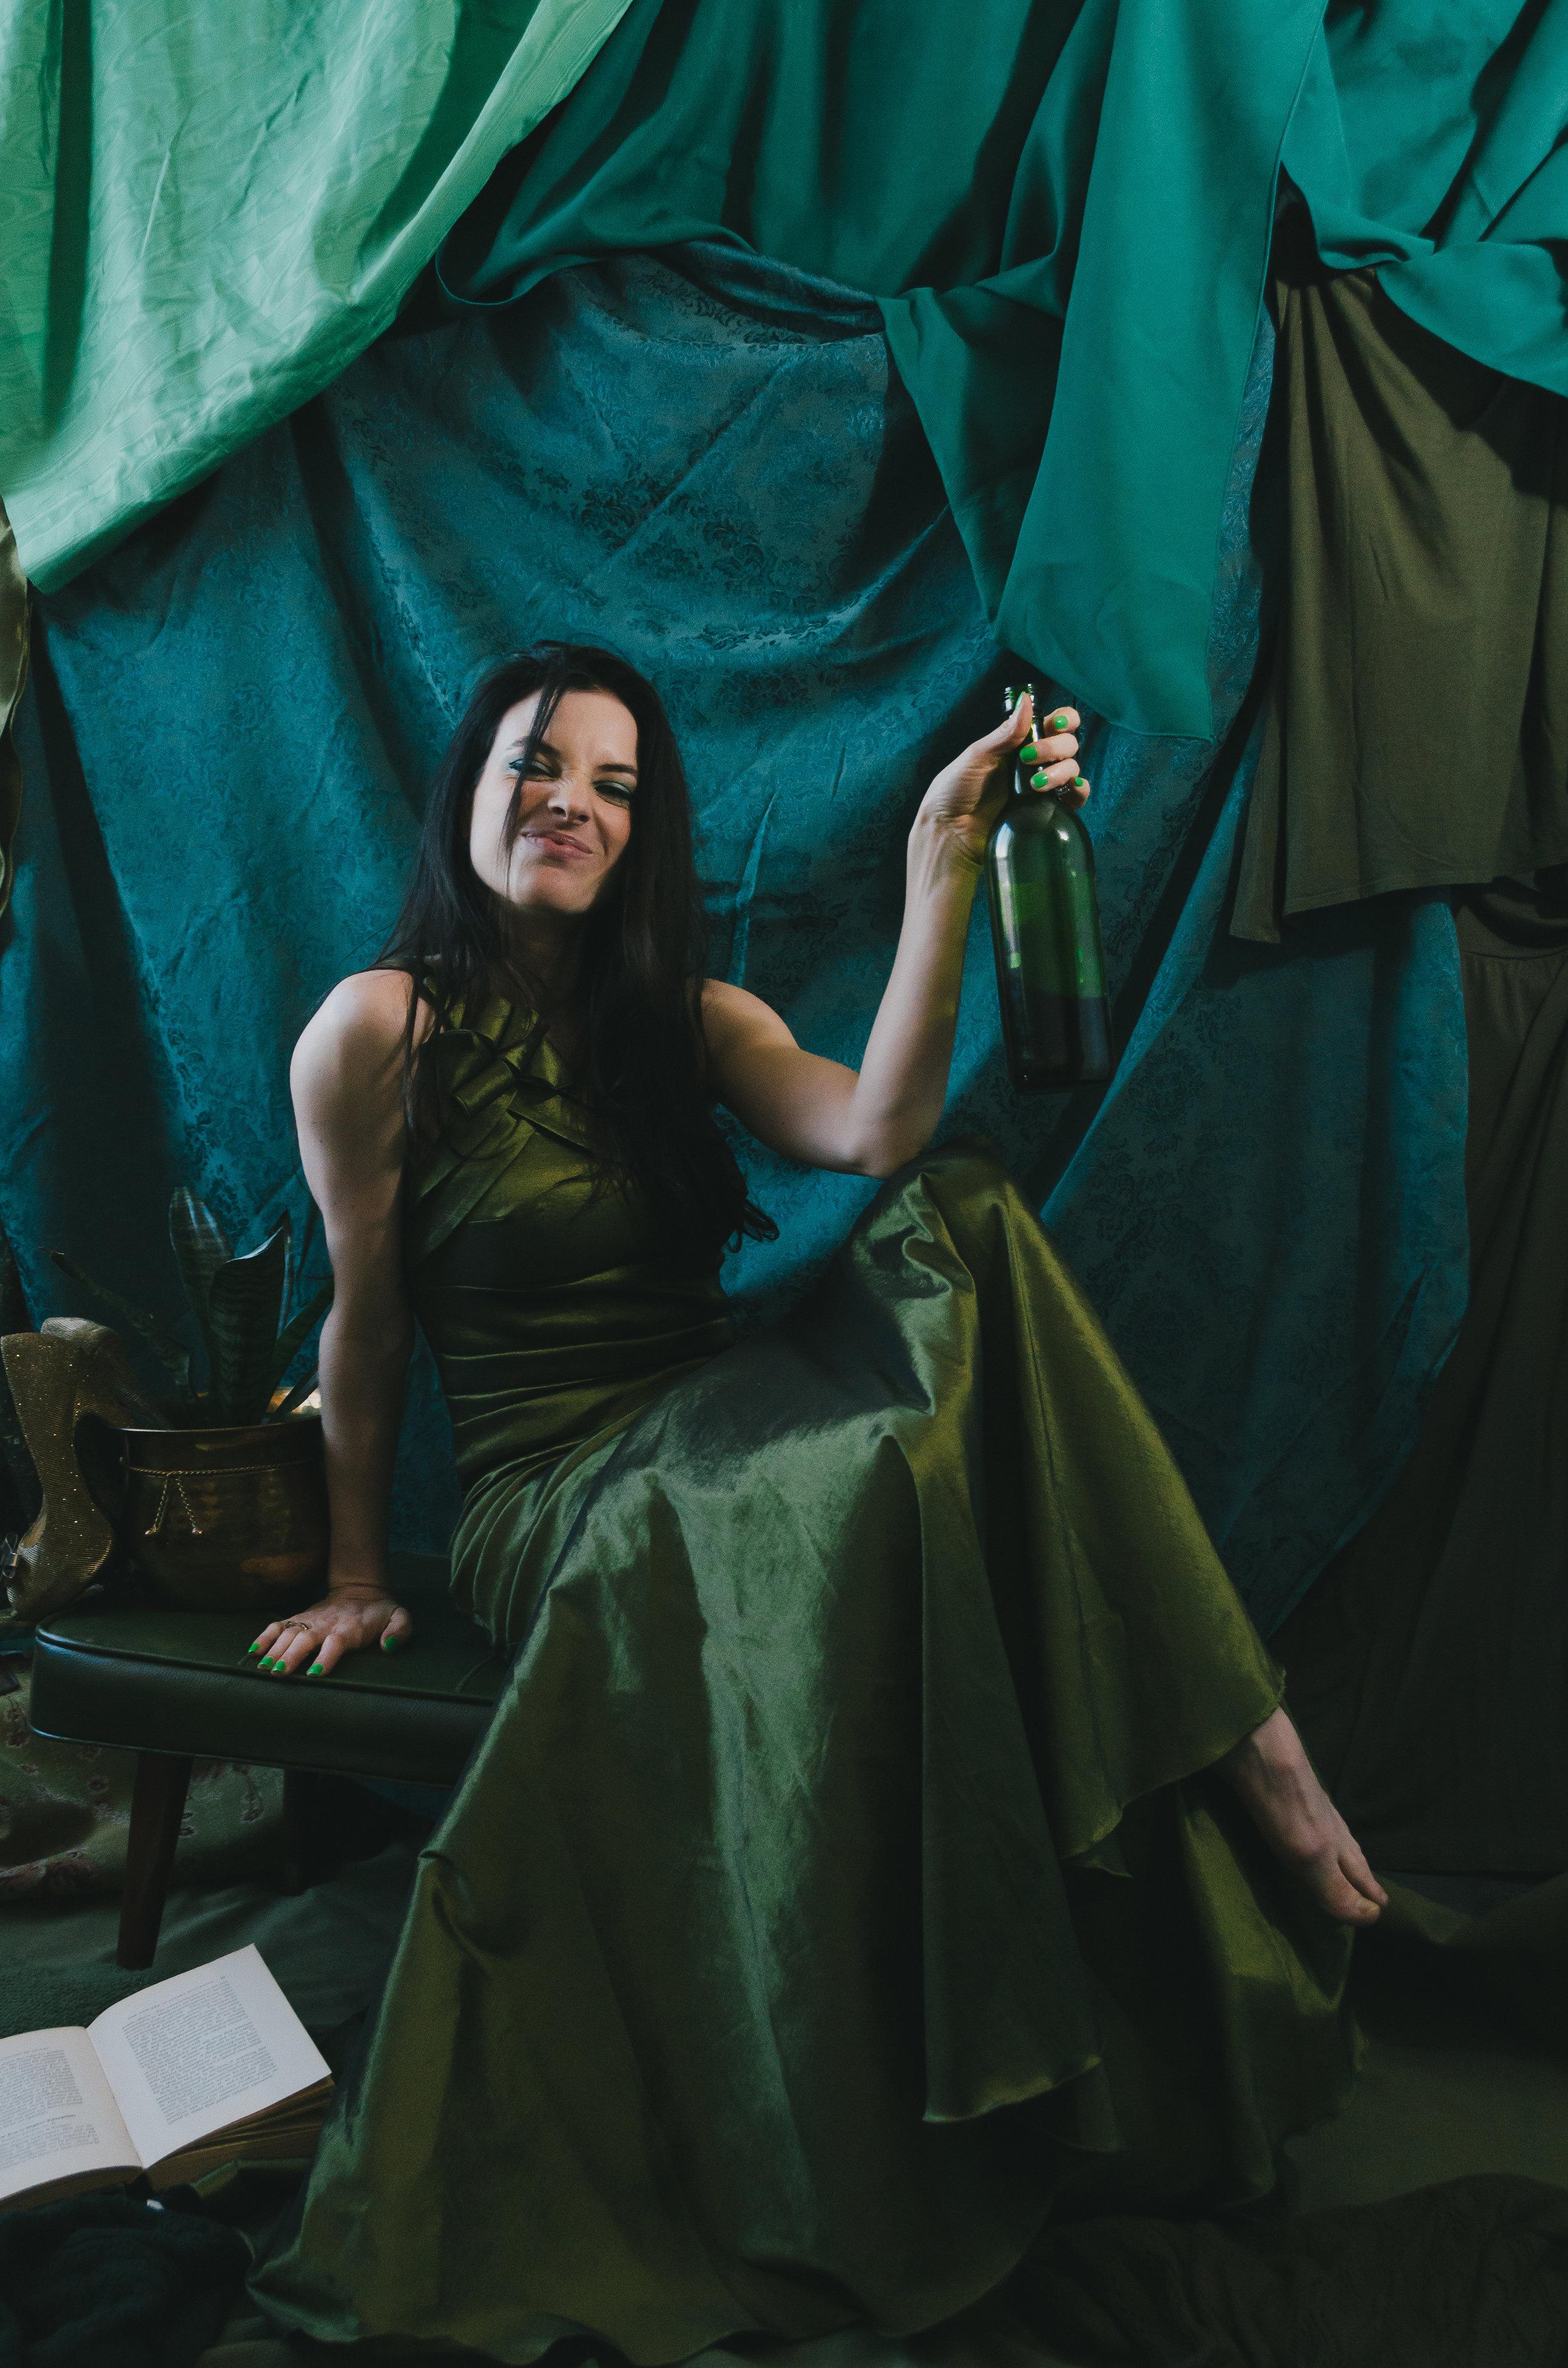 Adele at Thayne Jongewaard Photography Studio for the Green styled photo shoot.